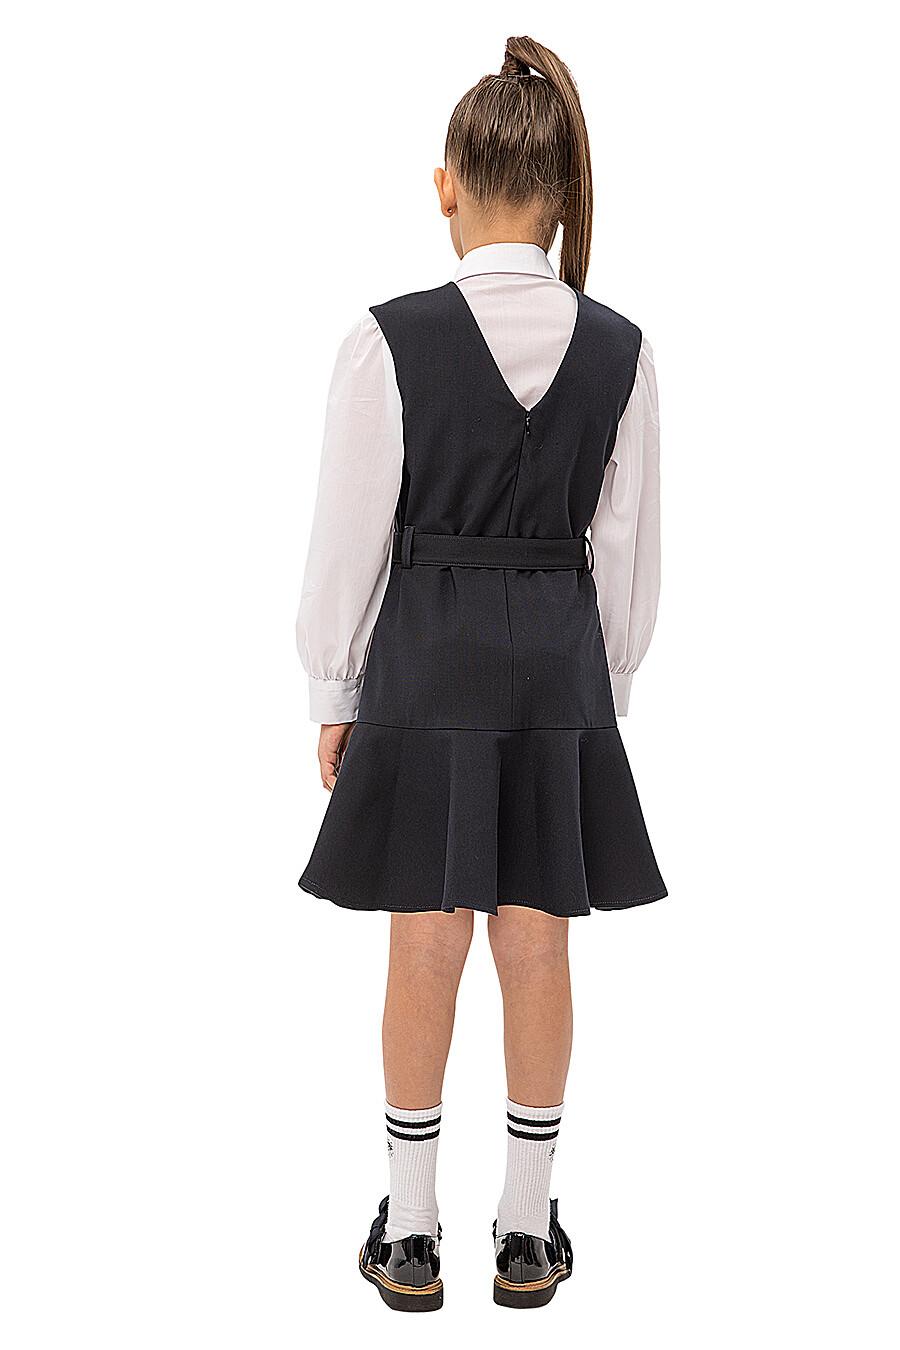 Сарафан КАРАМЕЛЛИ (683319), купить в Moyo.moda